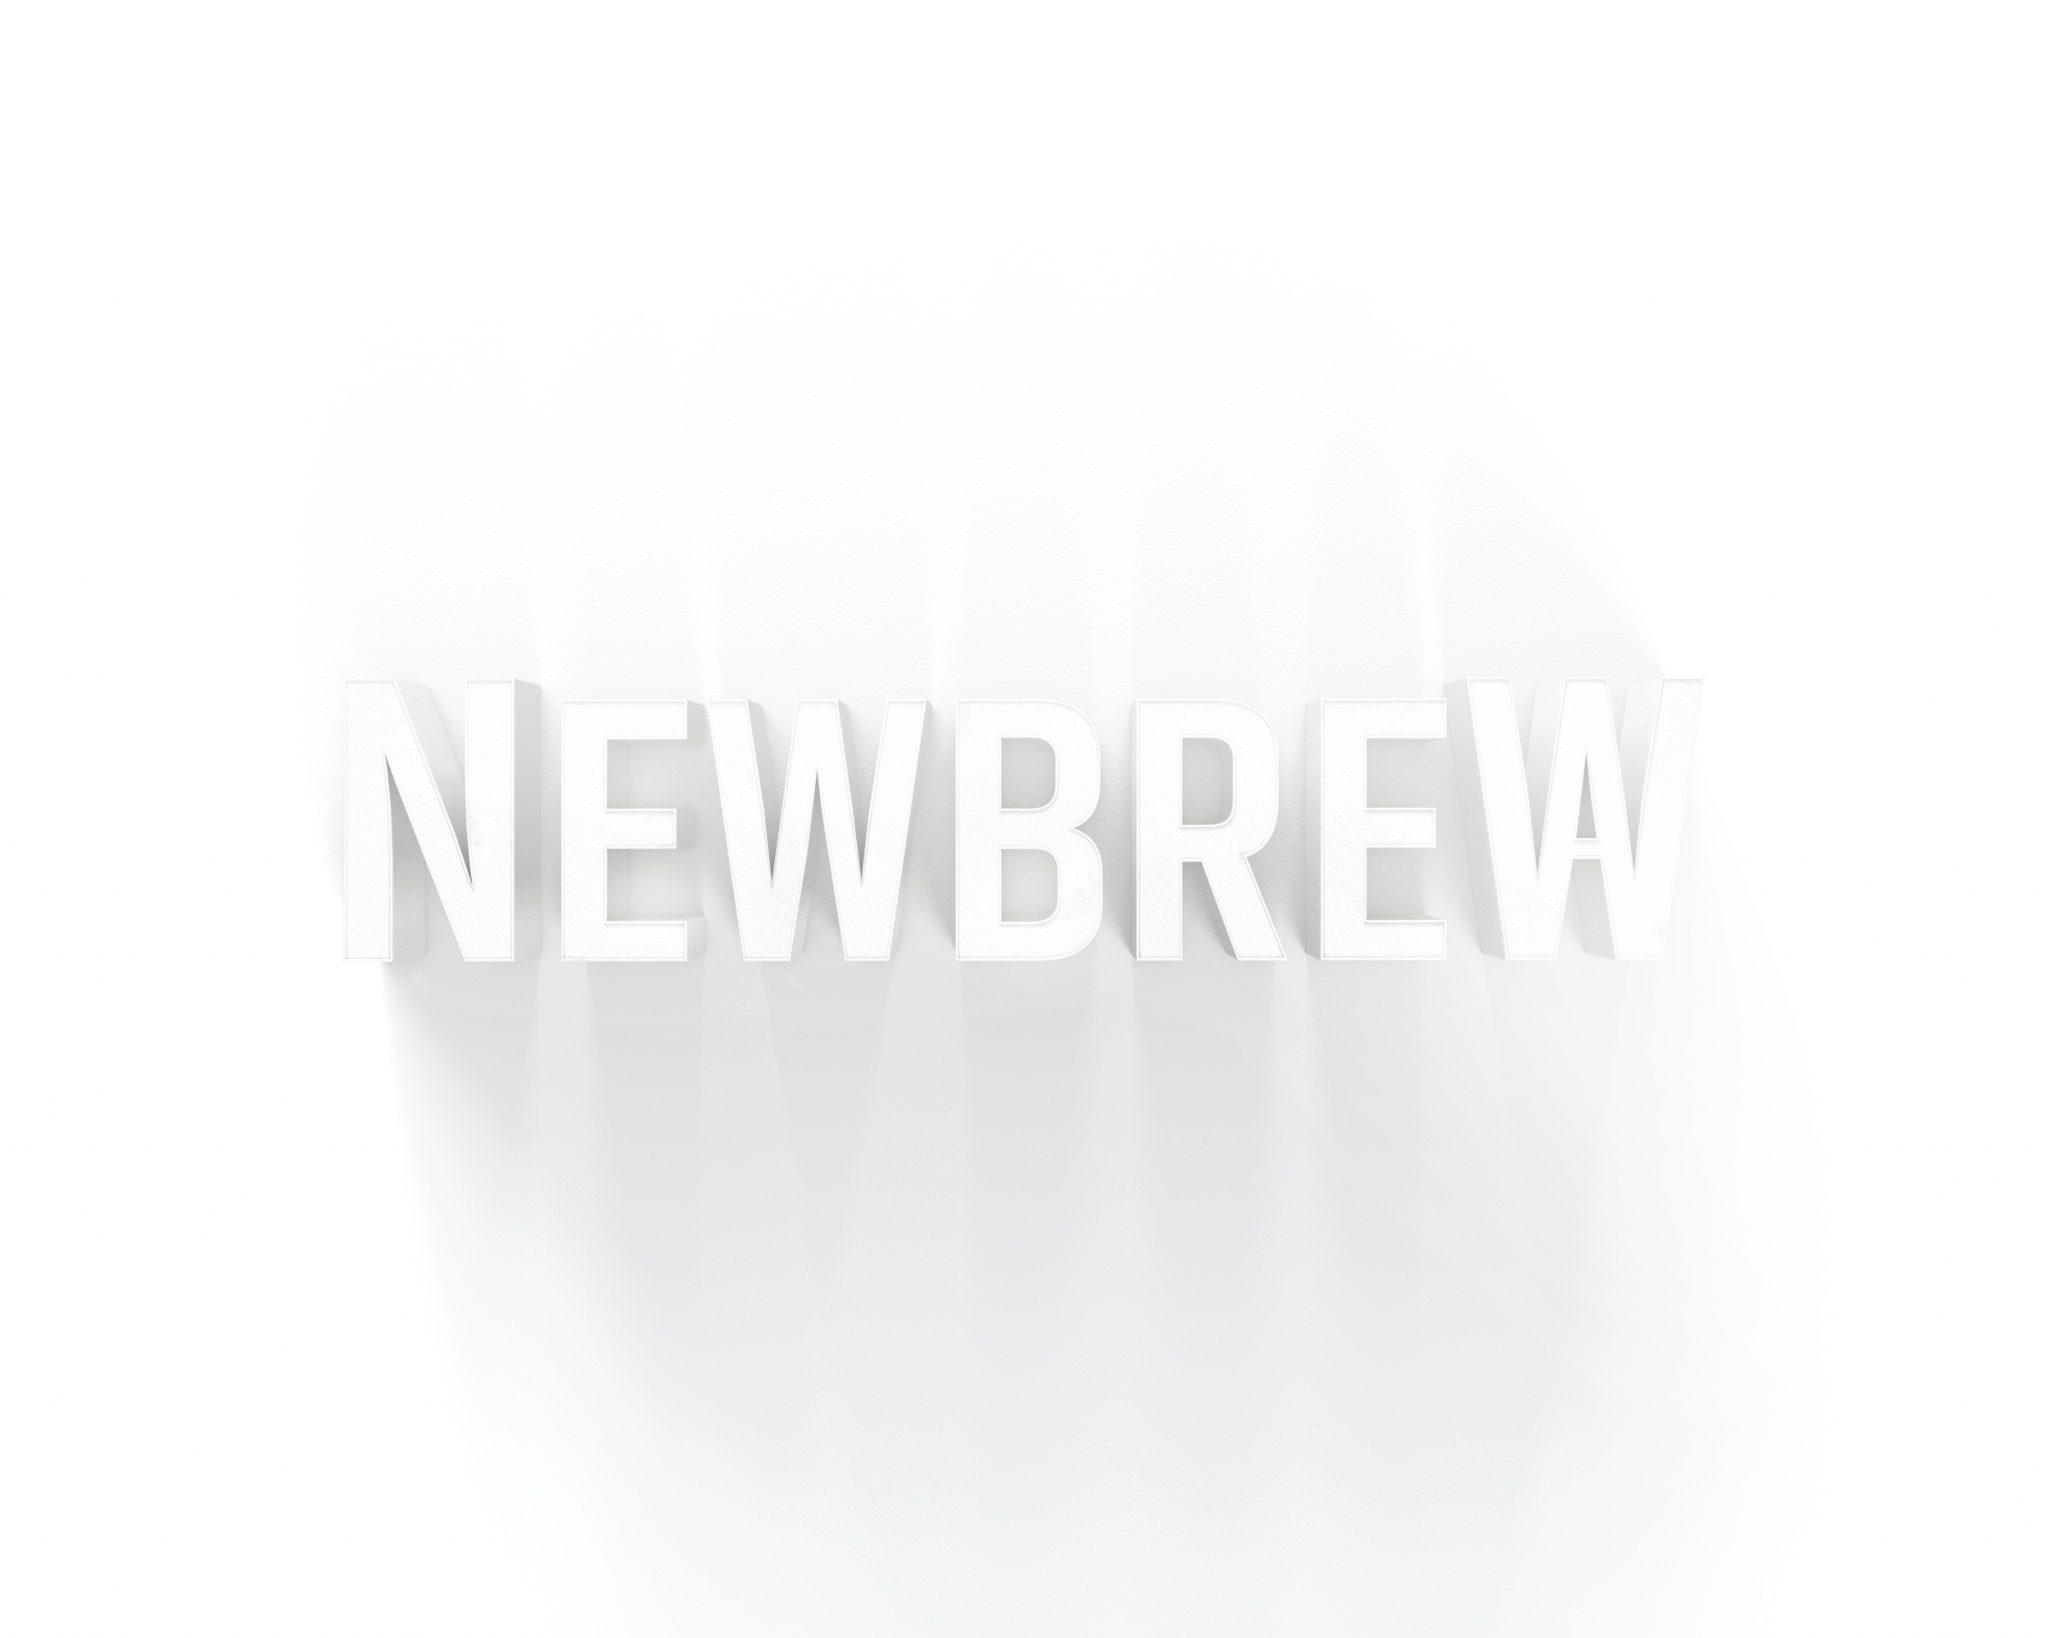 Design | Newbrew Web Development